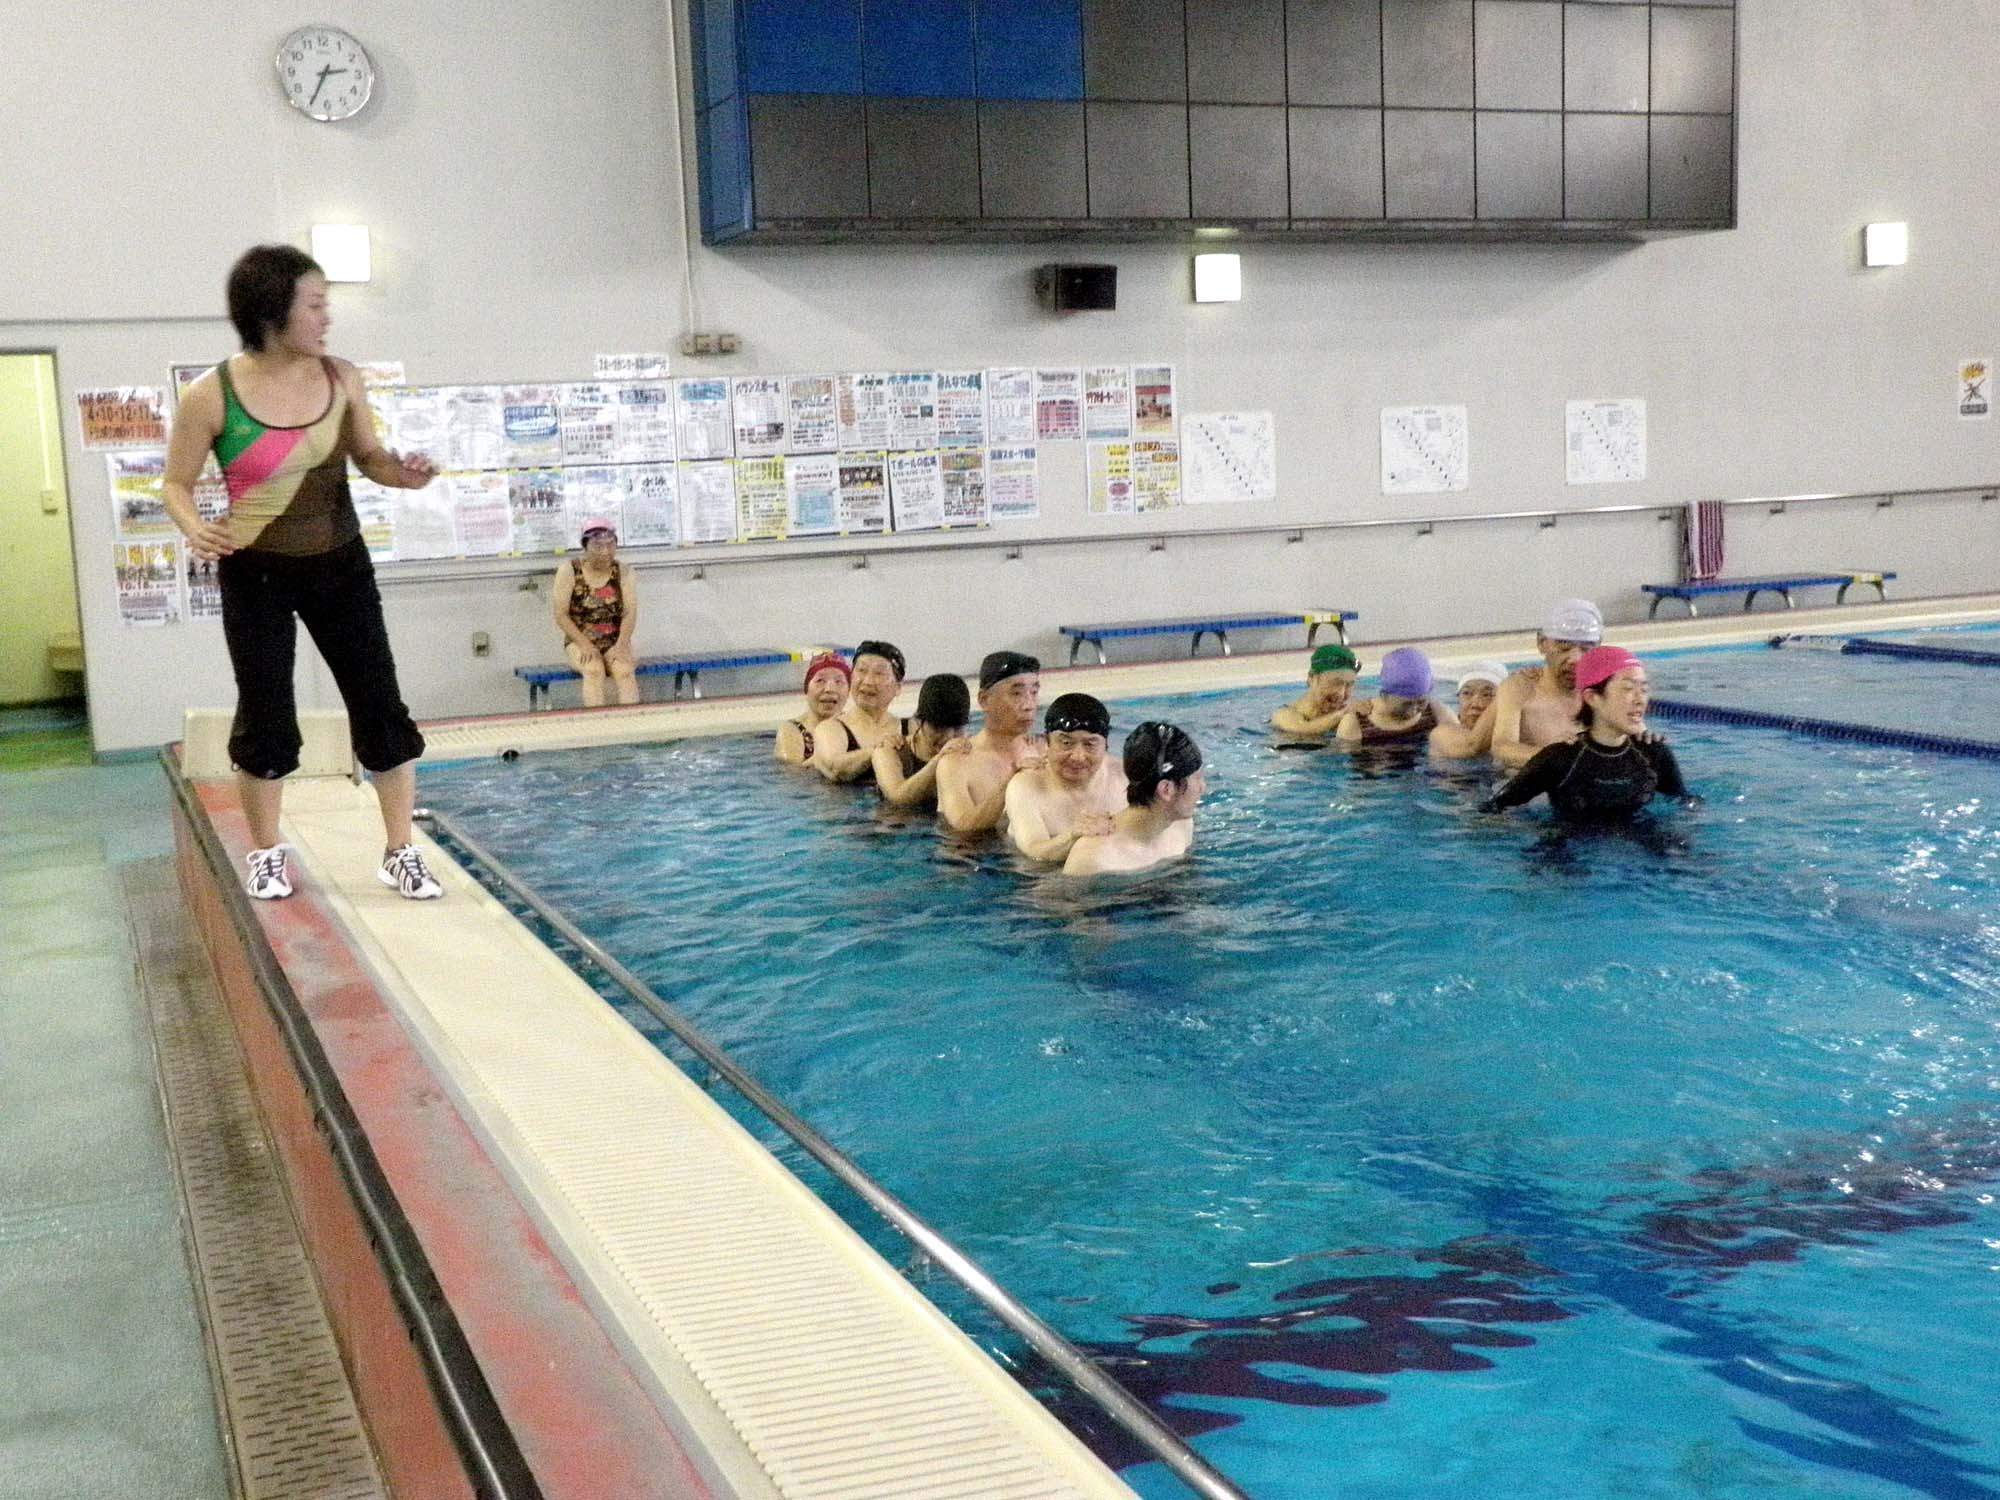 PA010317 - 水中運動教室より ・・・水のなかでエクササイズ。